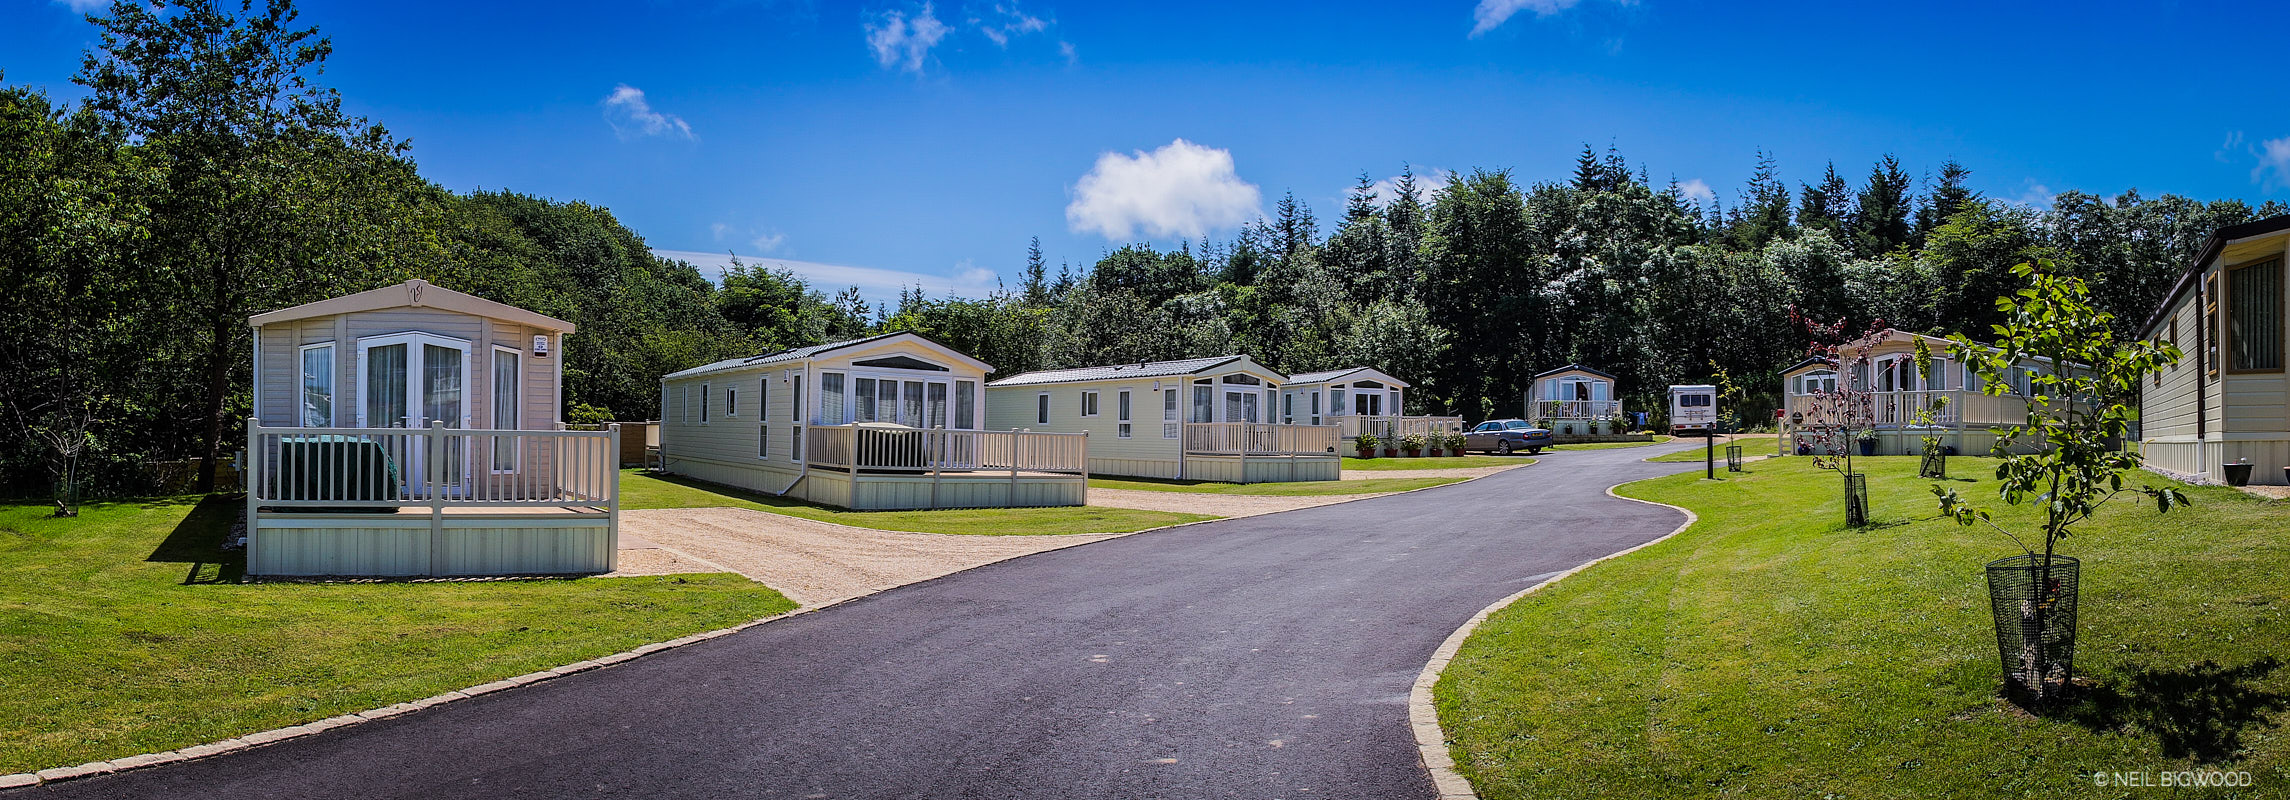 Neil-Bigwood-Monkton-Wyld-Holiday-Homes-71